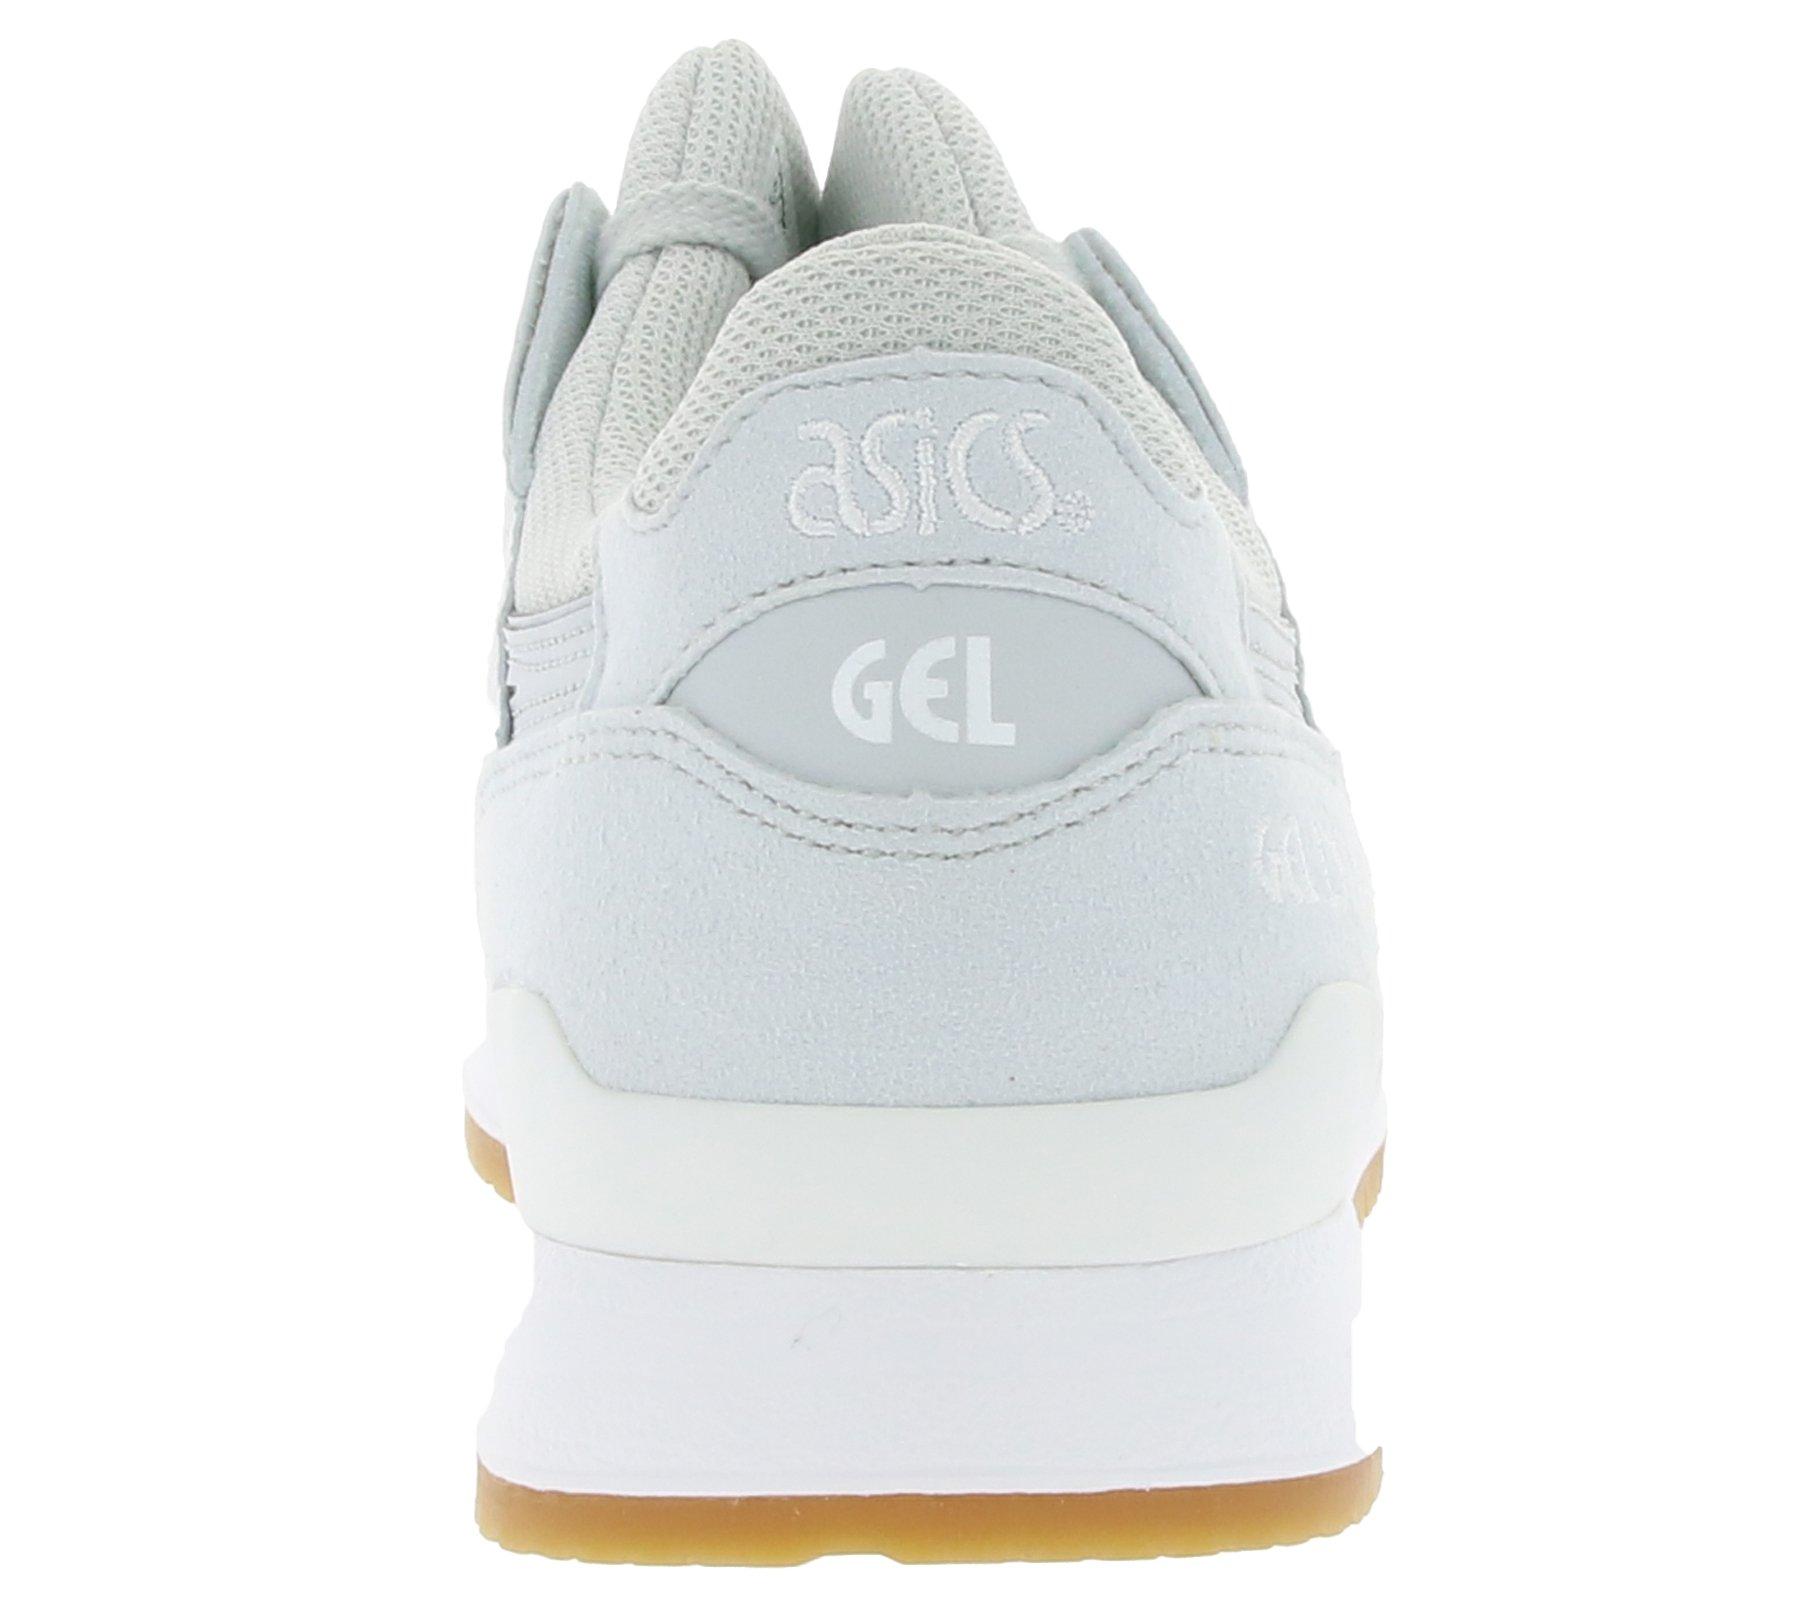 Sneaker Grigio Gel Grigio Mid 4 Asics lyte glacier uk Iii WAvg1q